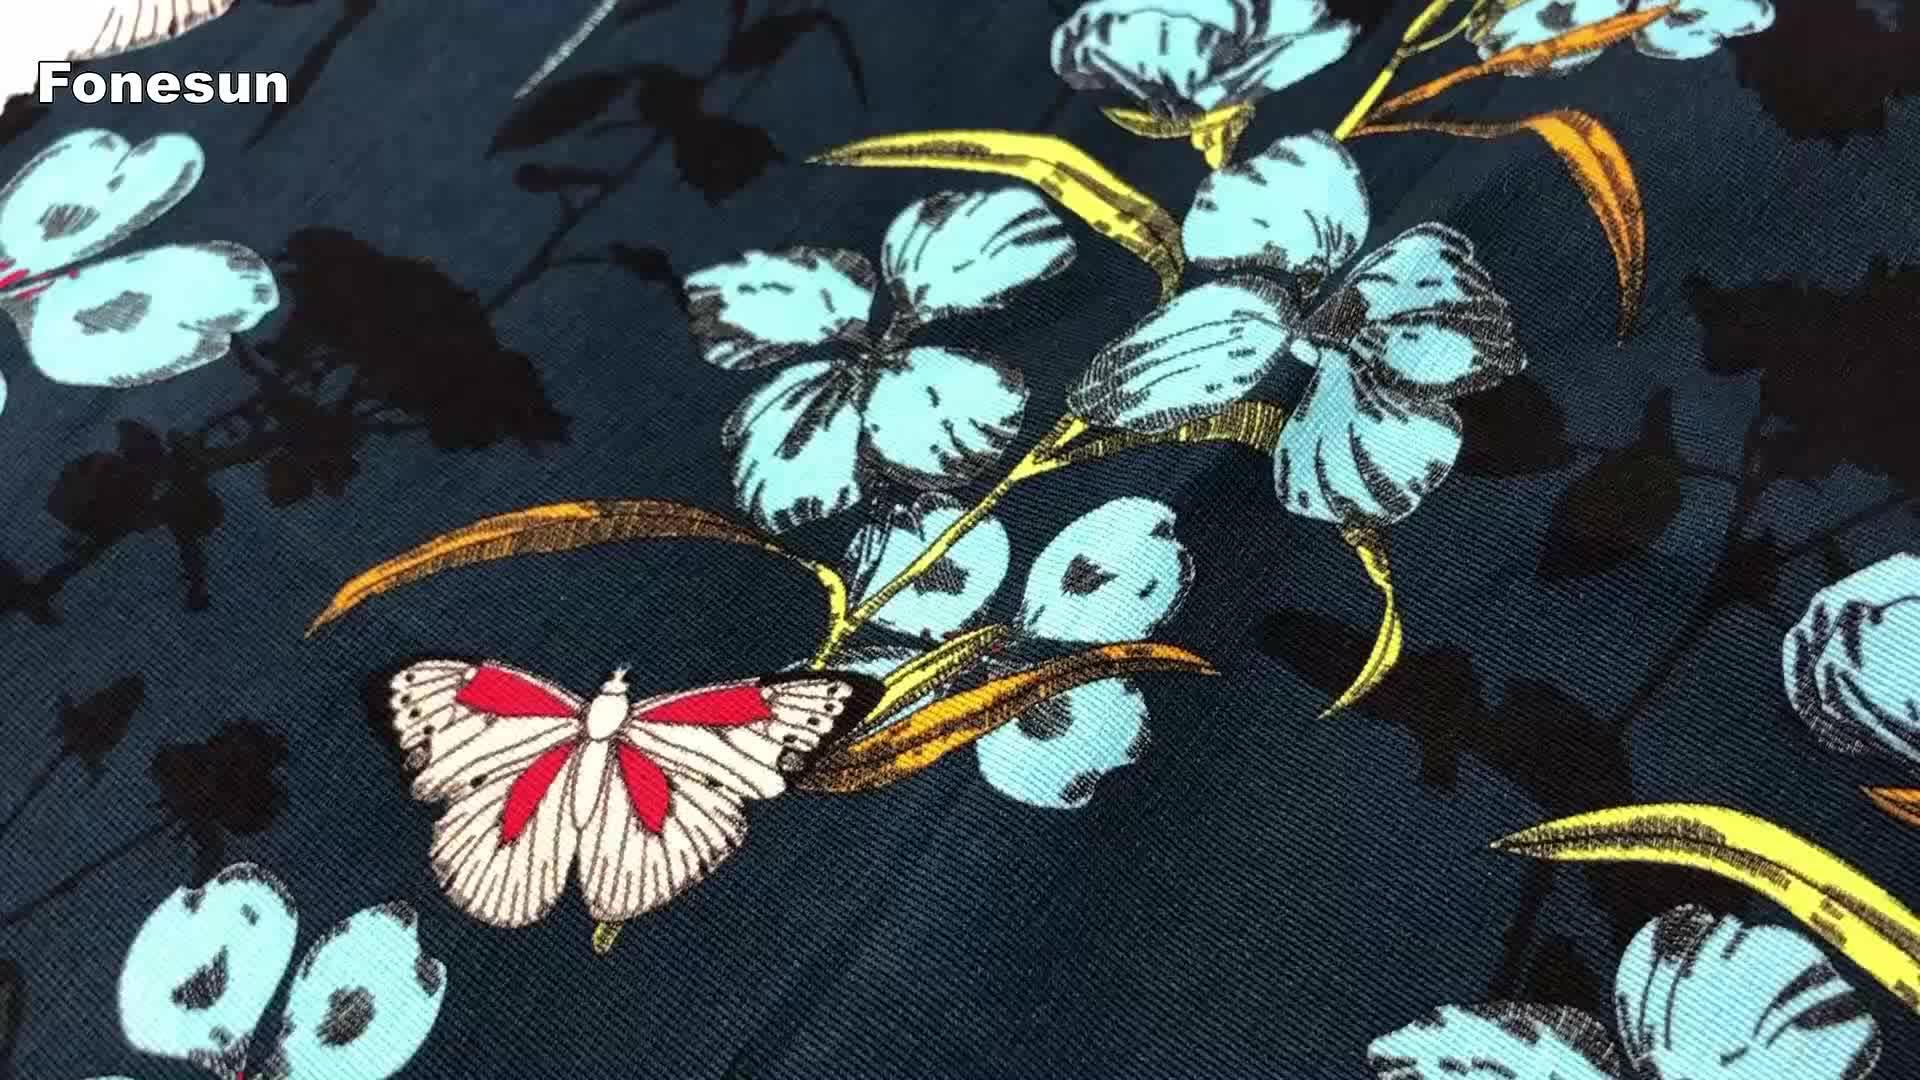 Fonesun-PS94 Wärme transfer digitaldruck stoff 100% polyester floral crepe chiffon für frauen kleid